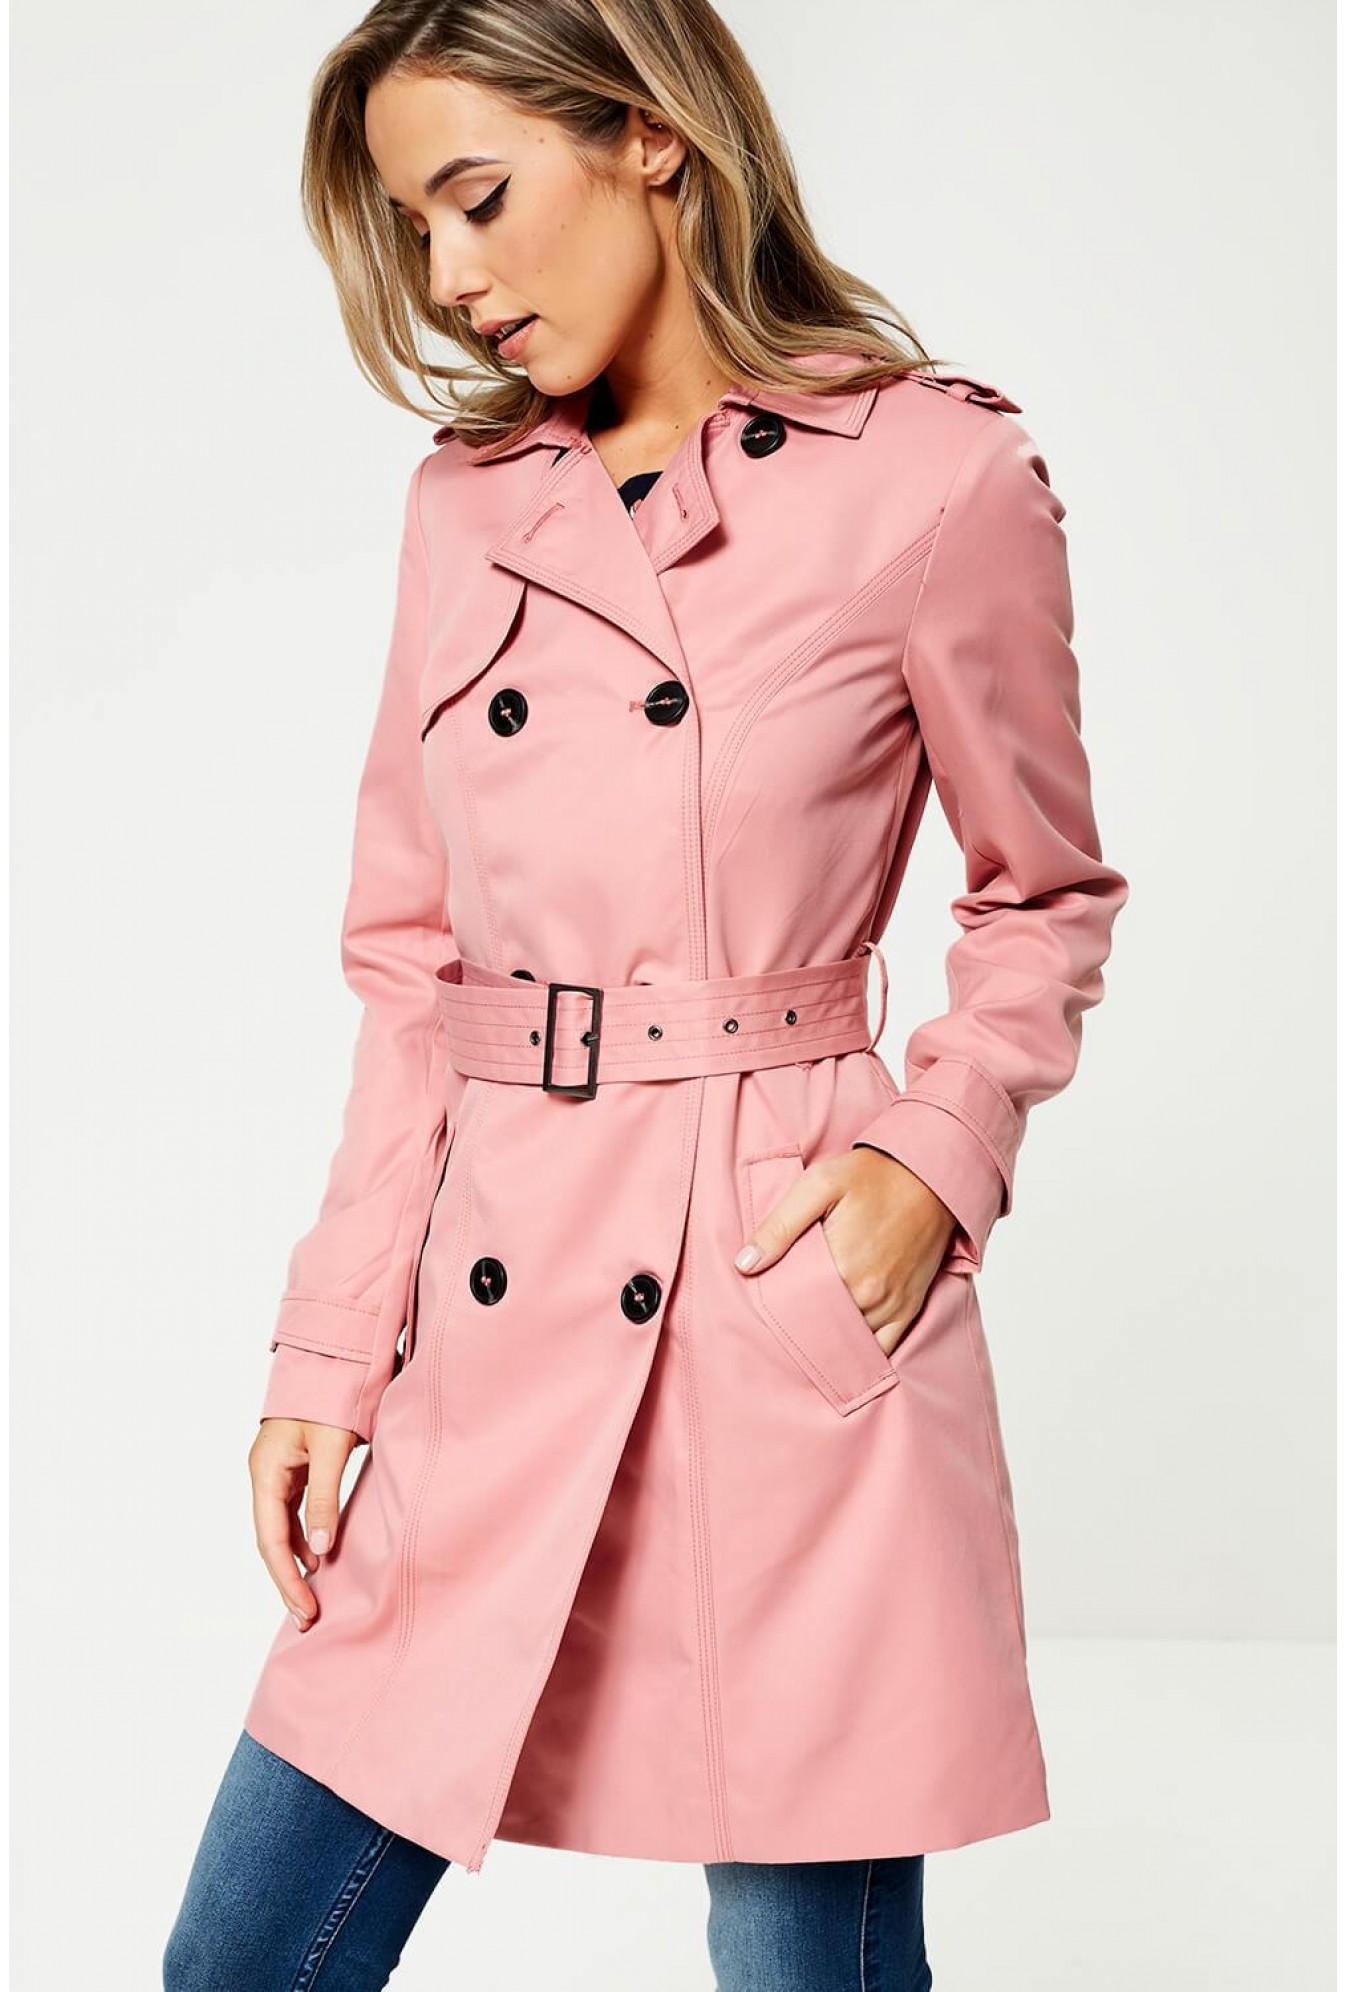 More Views. Three Classic Trench Coat in Pink. Vero Moda b2247dd922